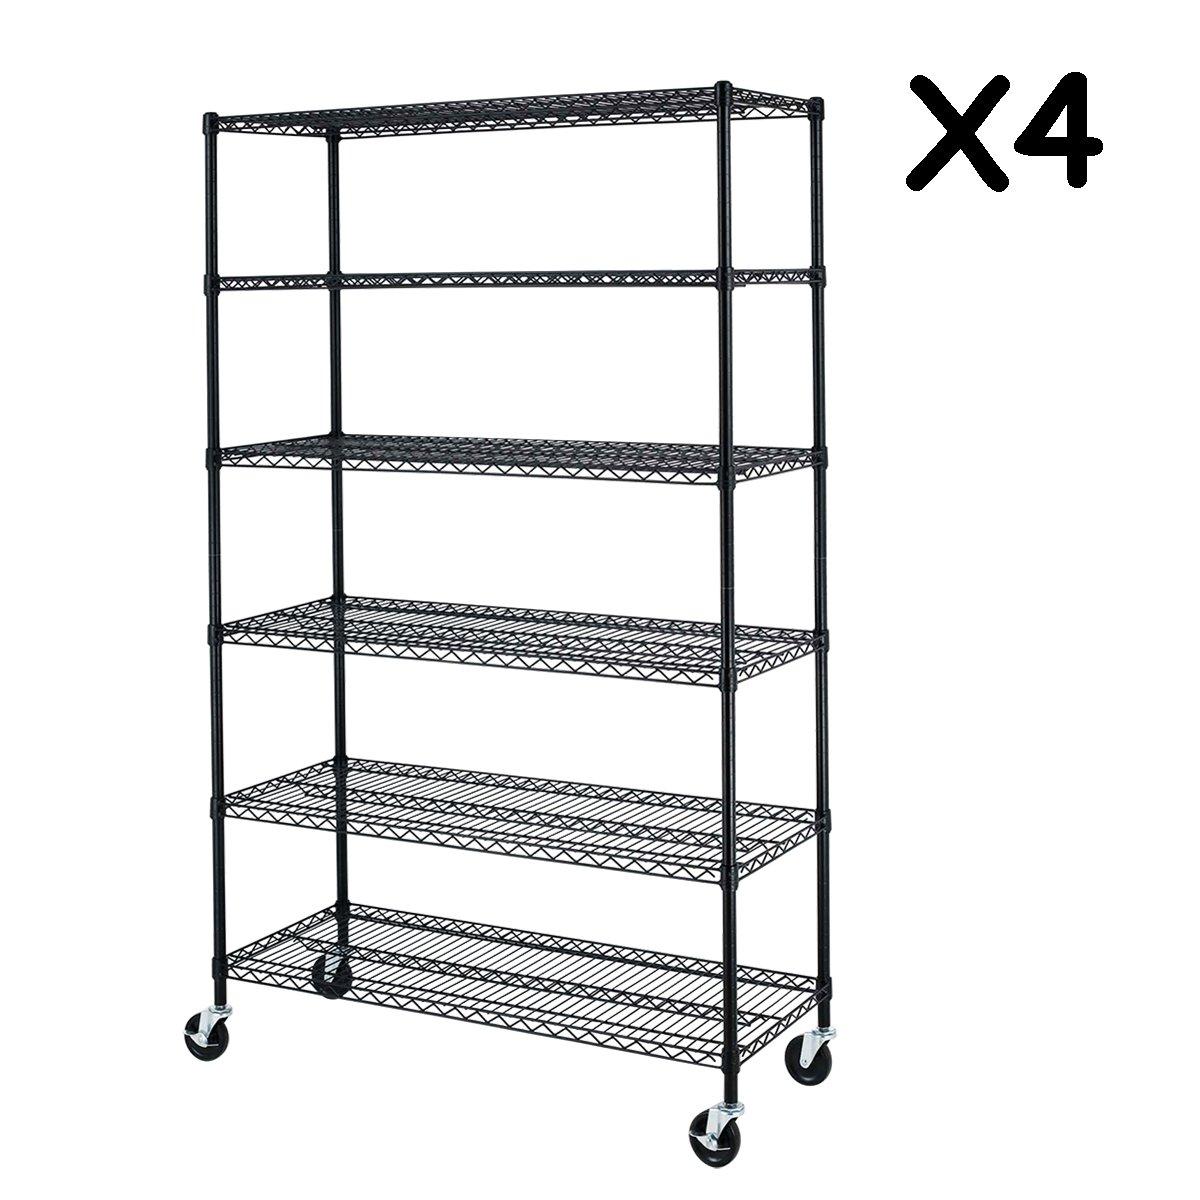 6 Tier Adjustable Wire Metal Shelving Rack, 82x48x18-Inch, Black 4pcs